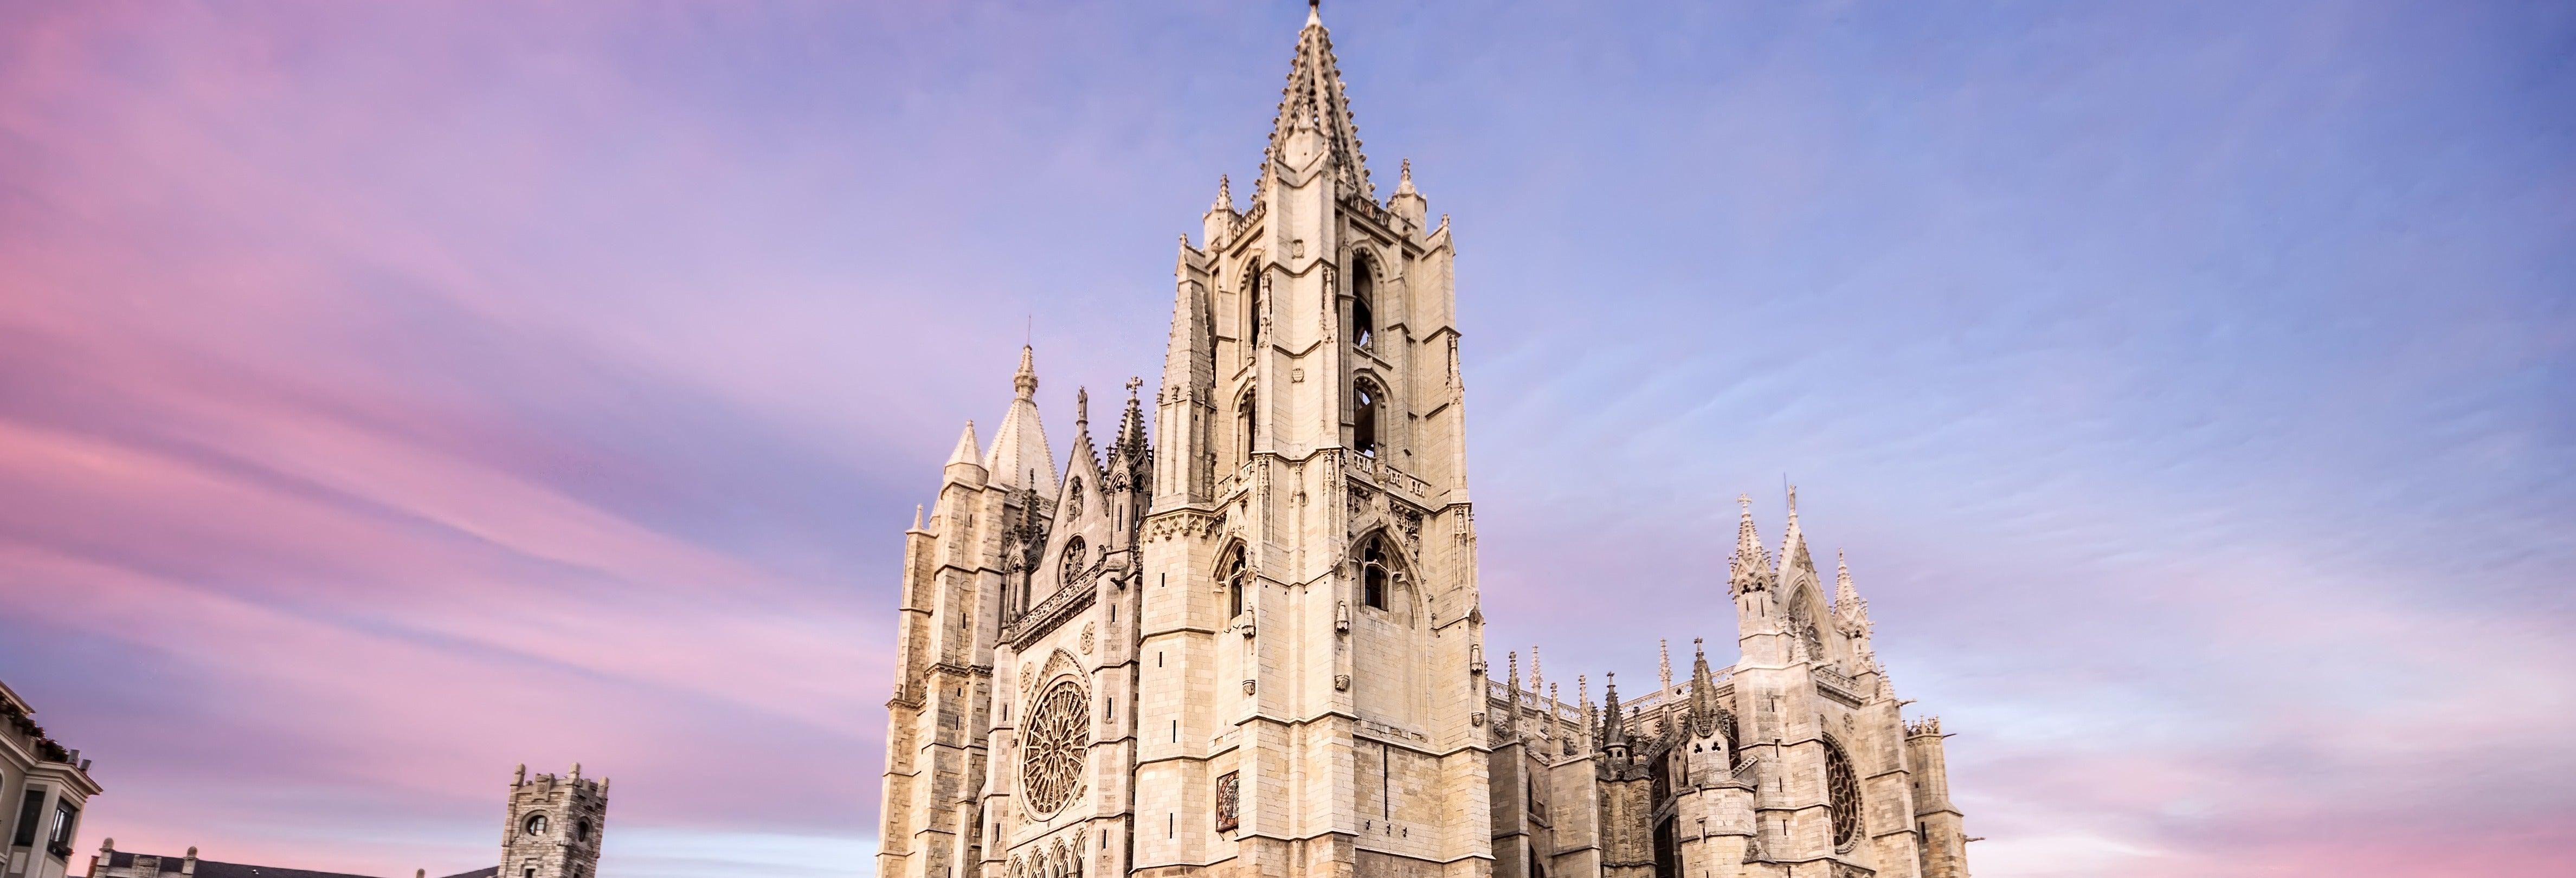 Visita guiada pela Catedral de León